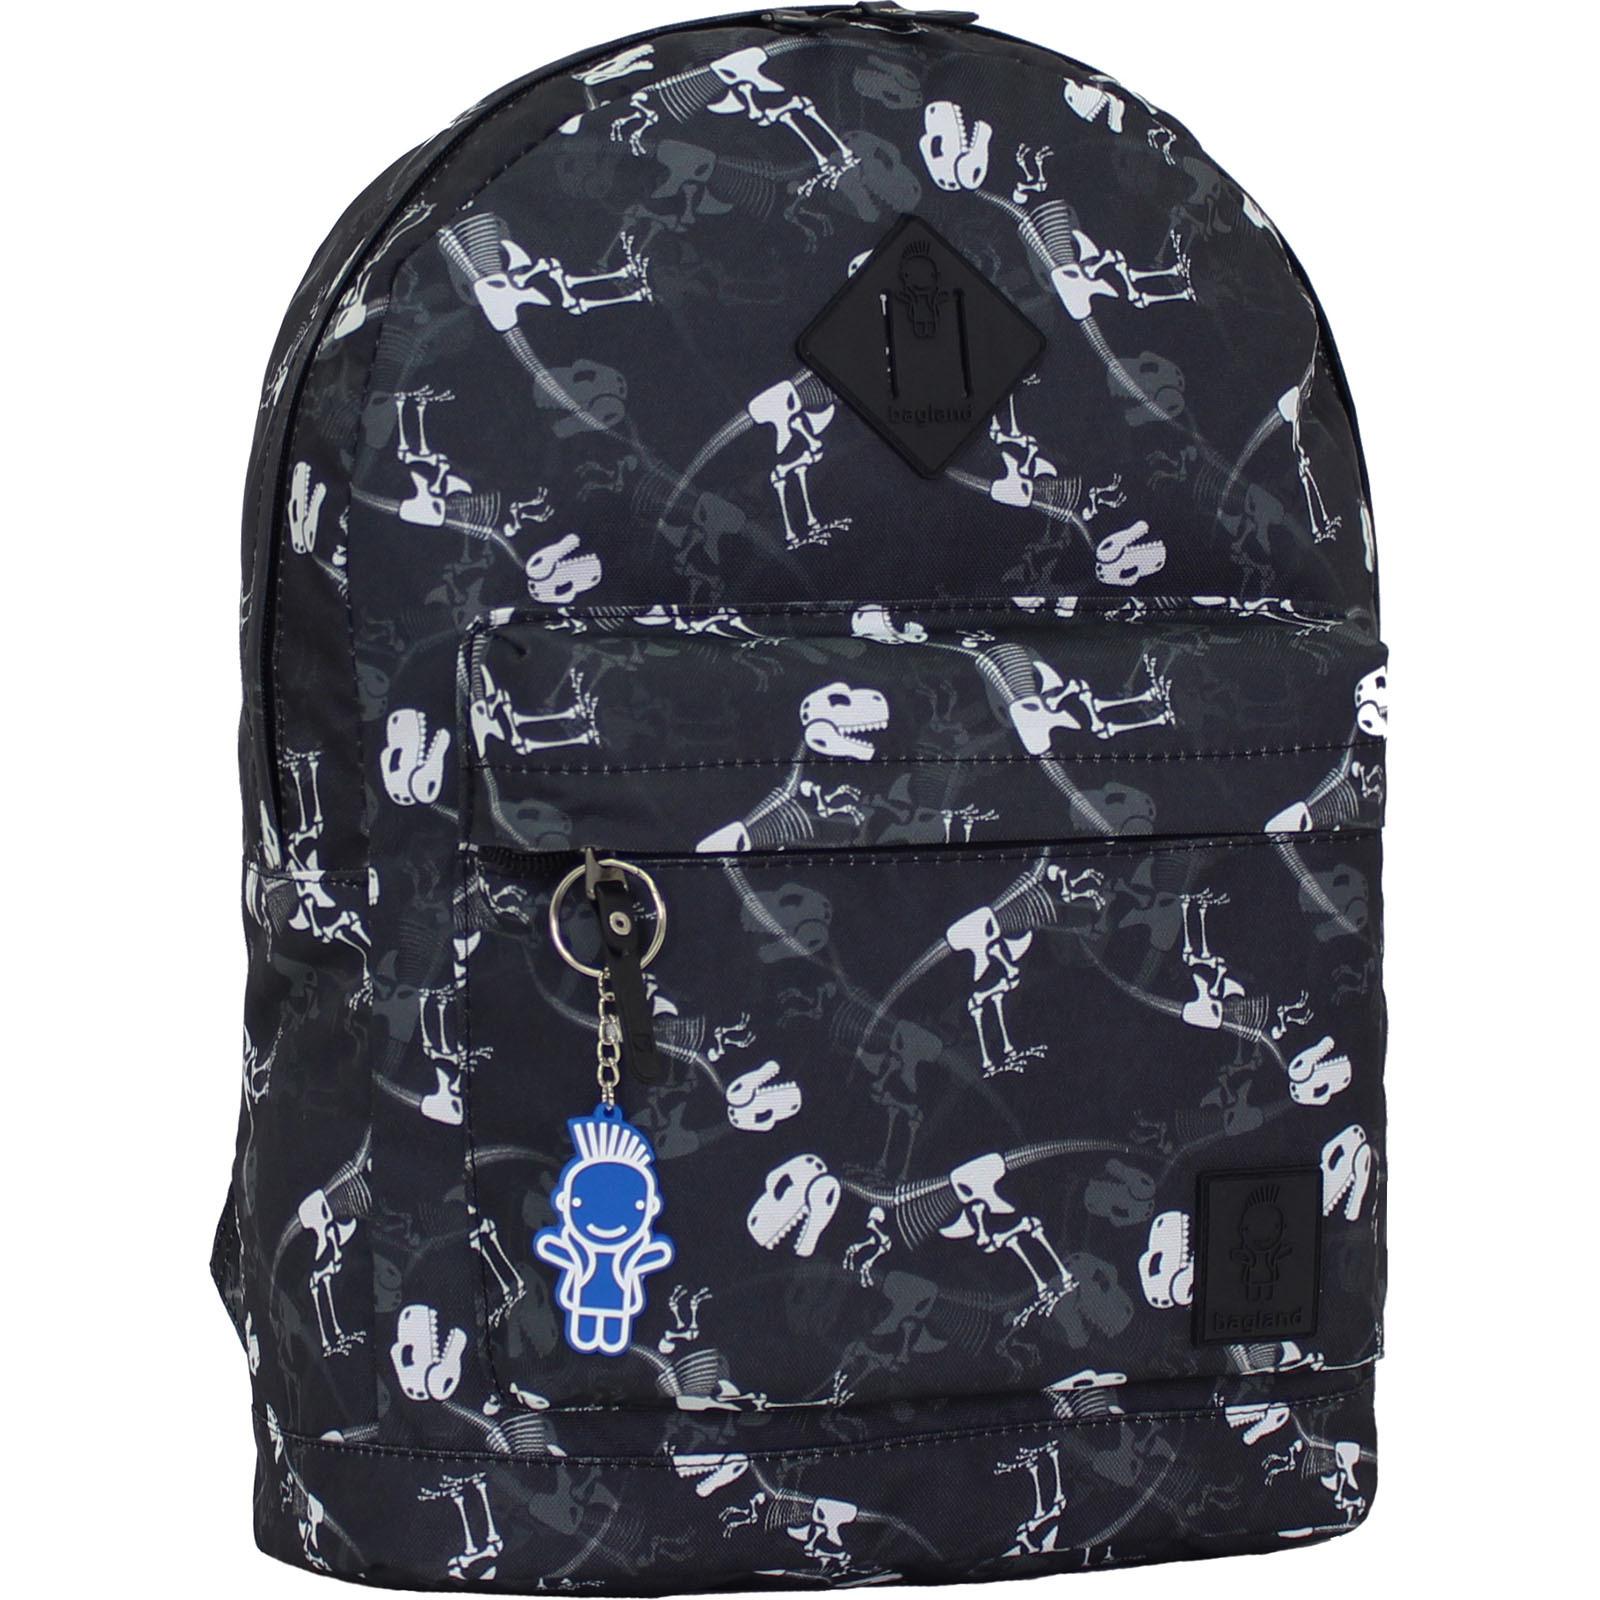 Городские рюкзаки Рюкзак Bagland Молодежный (дизайн) 17 л. сублимация 245 (00533664) IMG_1082_245.JPG